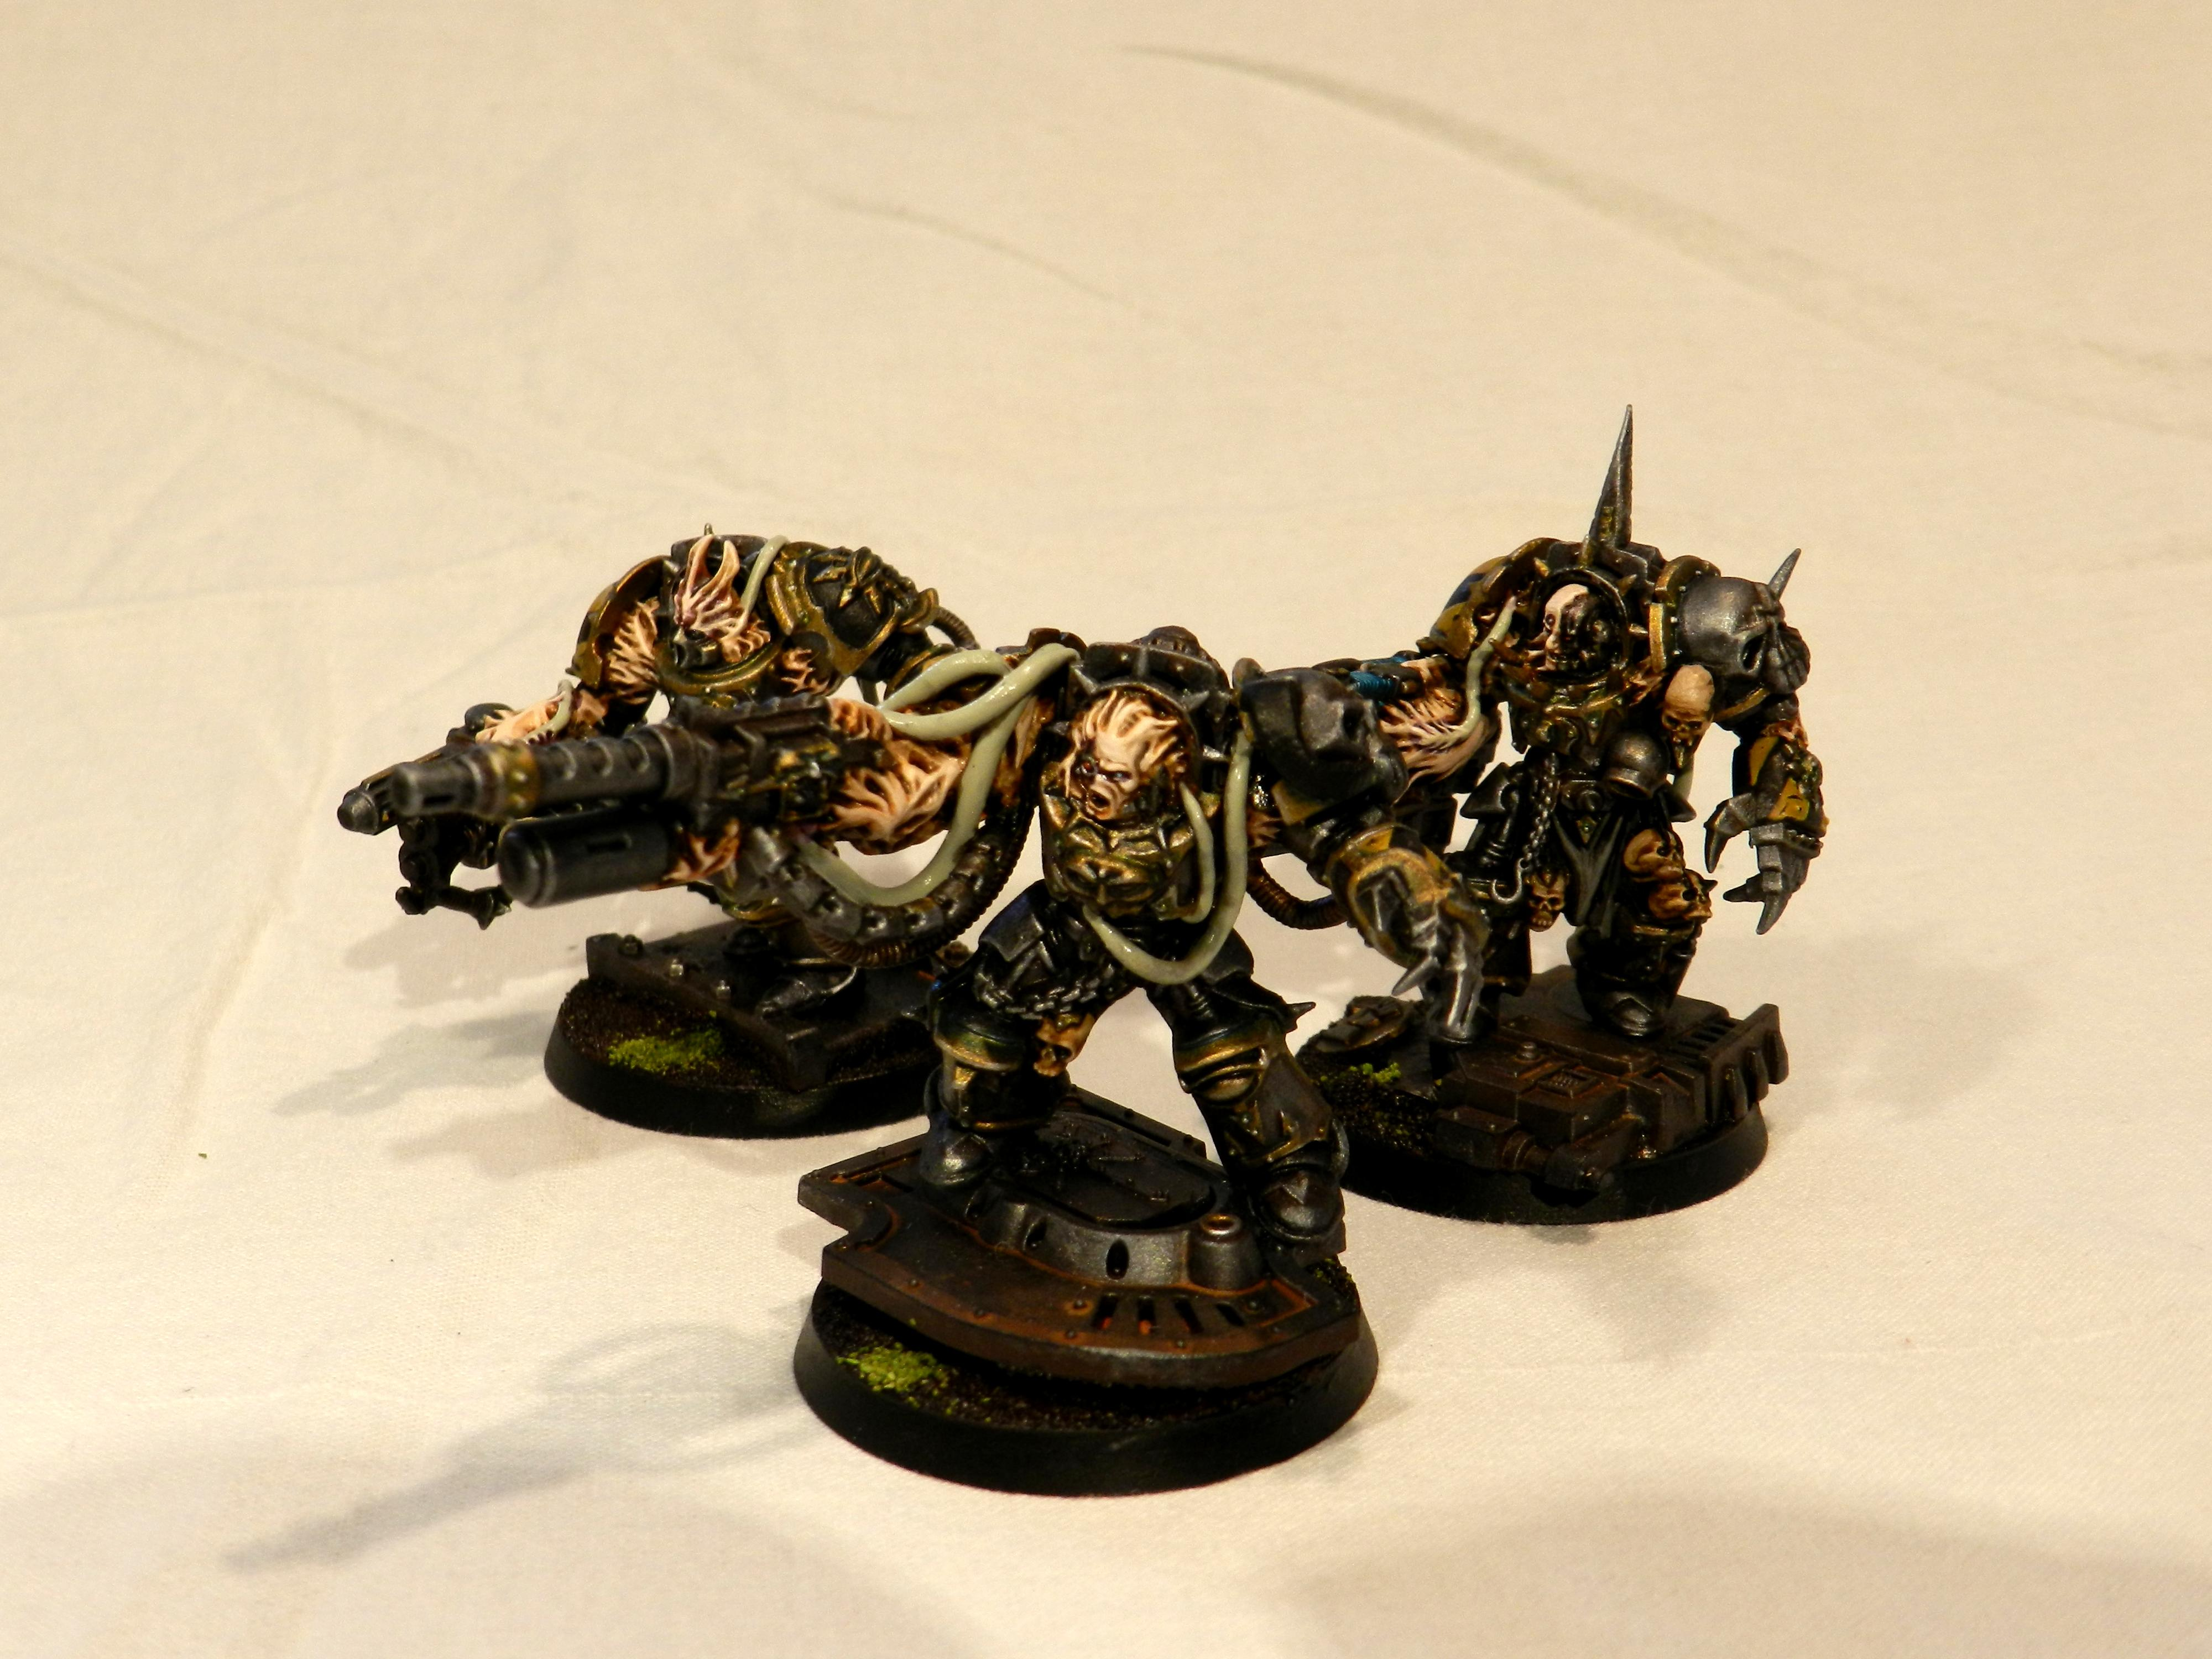 Chaos Space Marines, Daemons, Iron Warriors, Obliterators